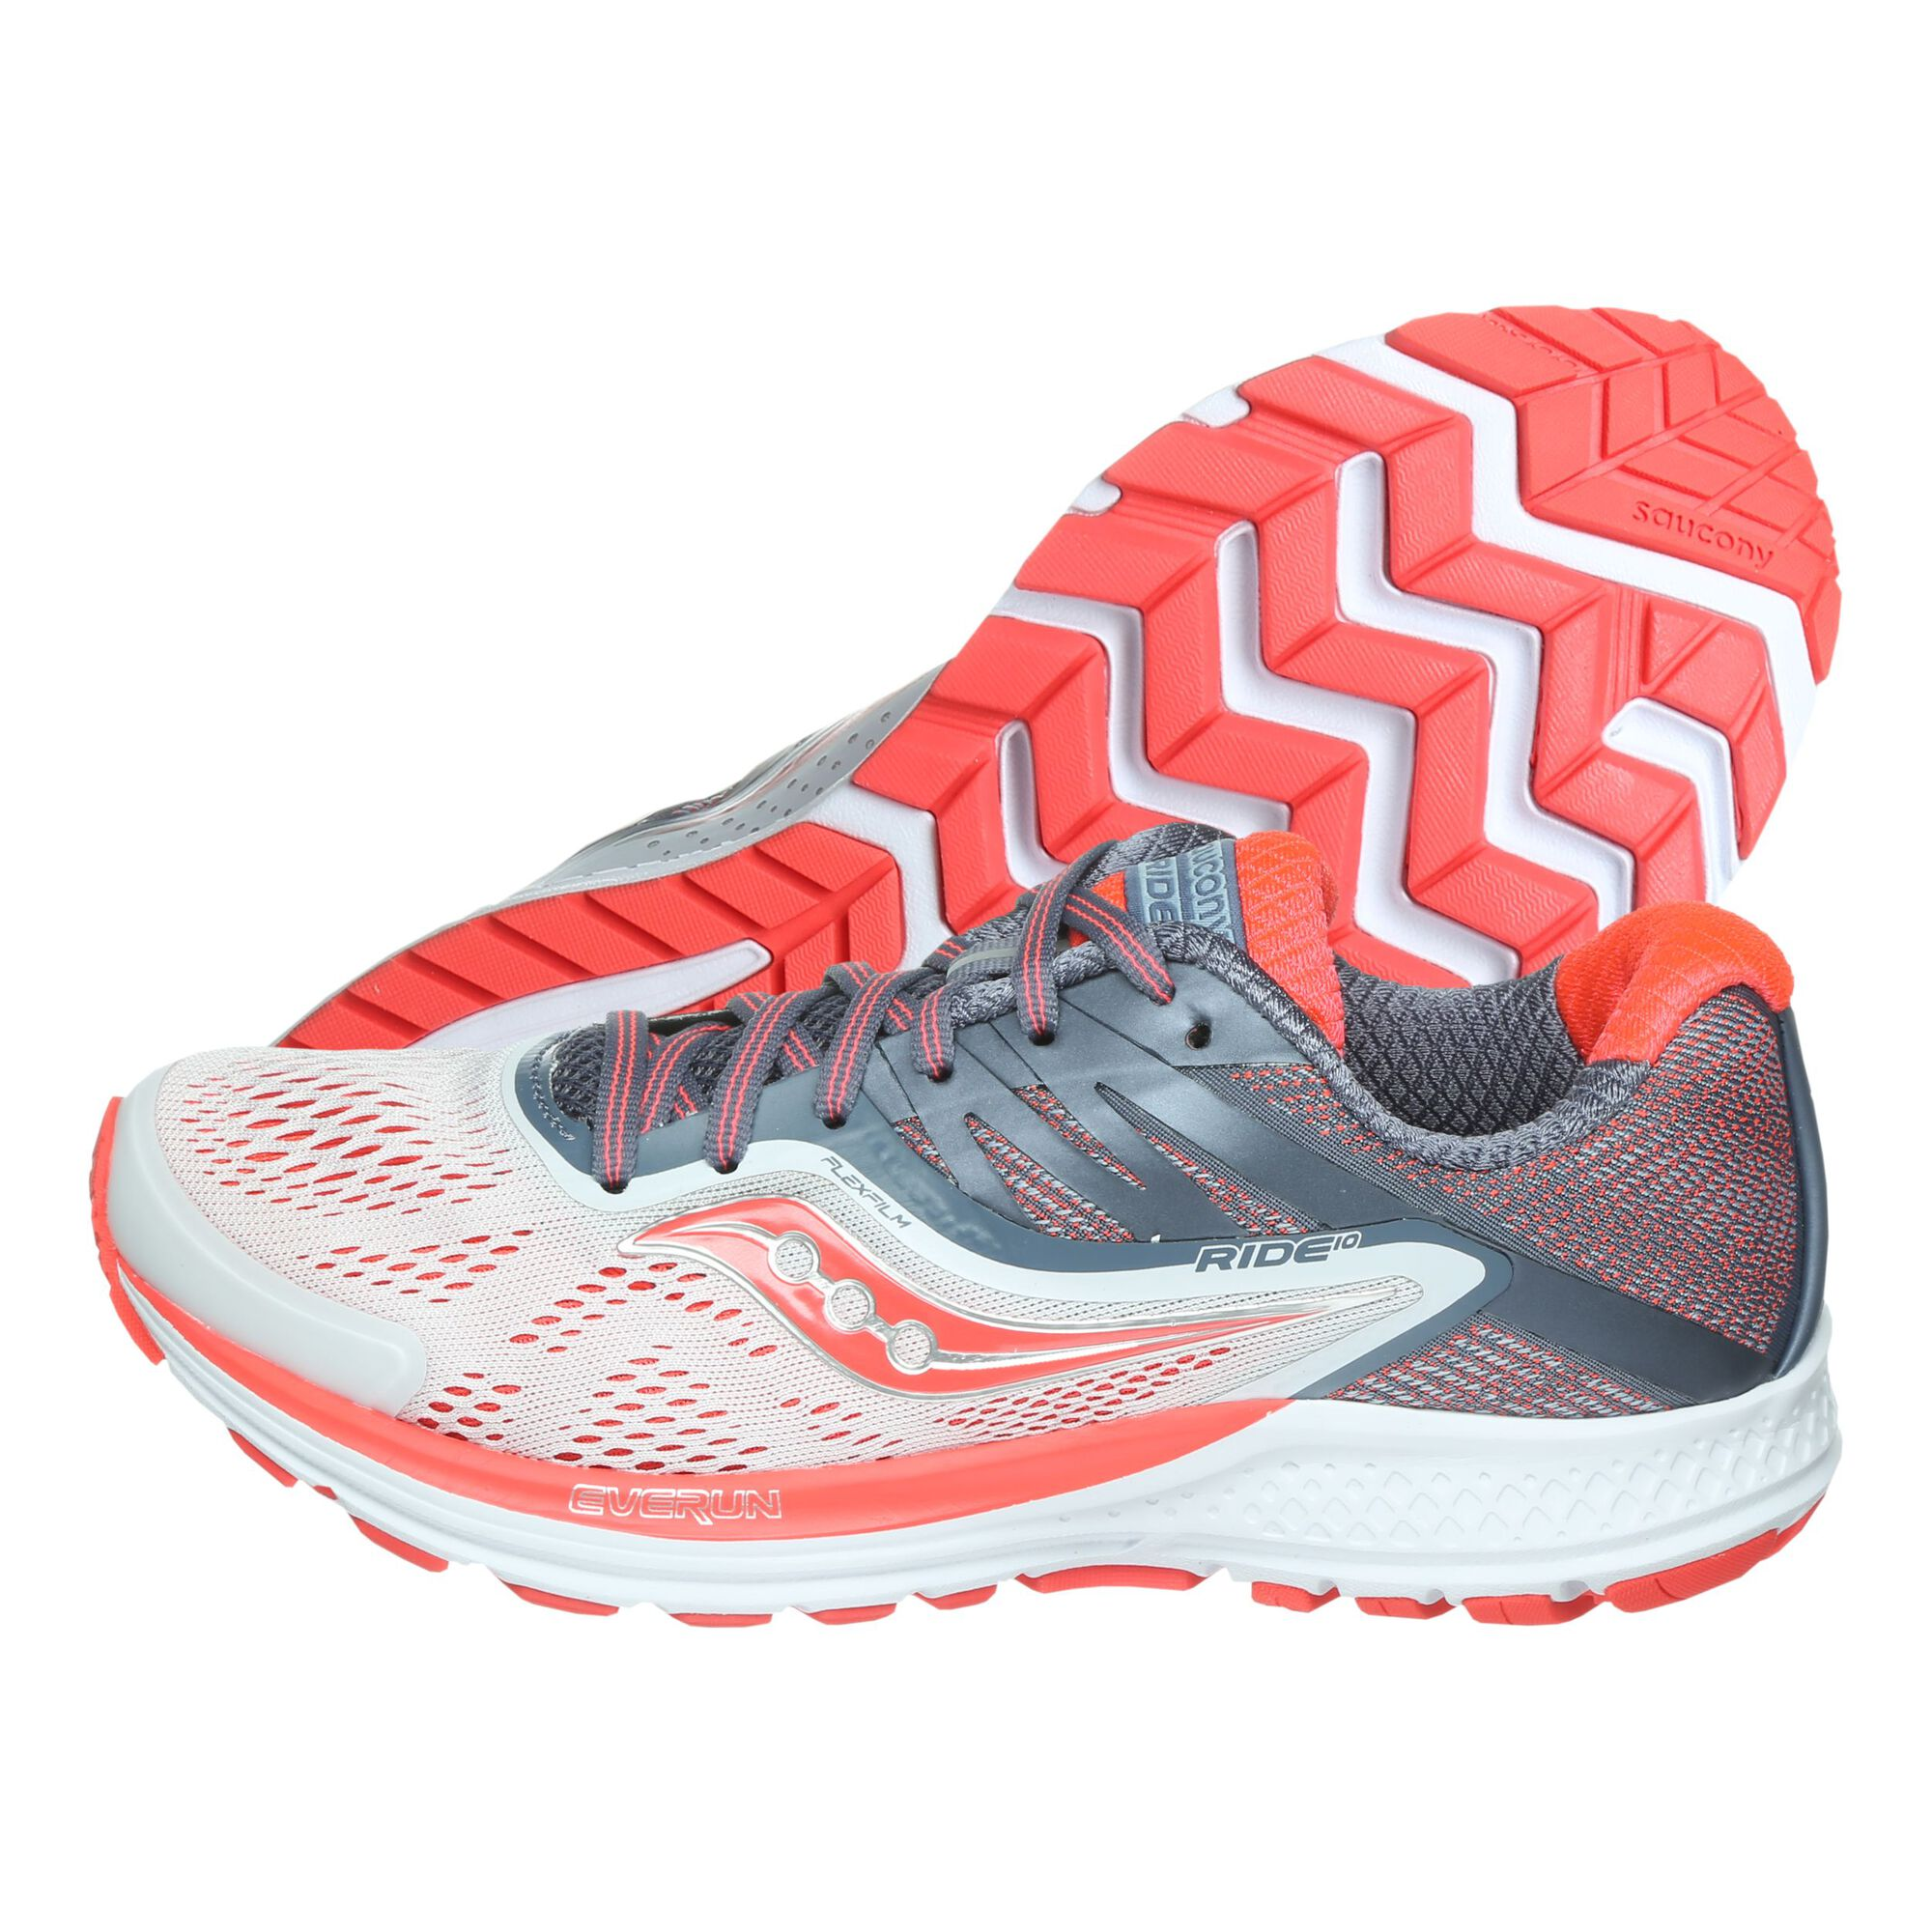 5c7d576015b buy Saucony Ride 10 Neutral Running Shoe Women - Orange